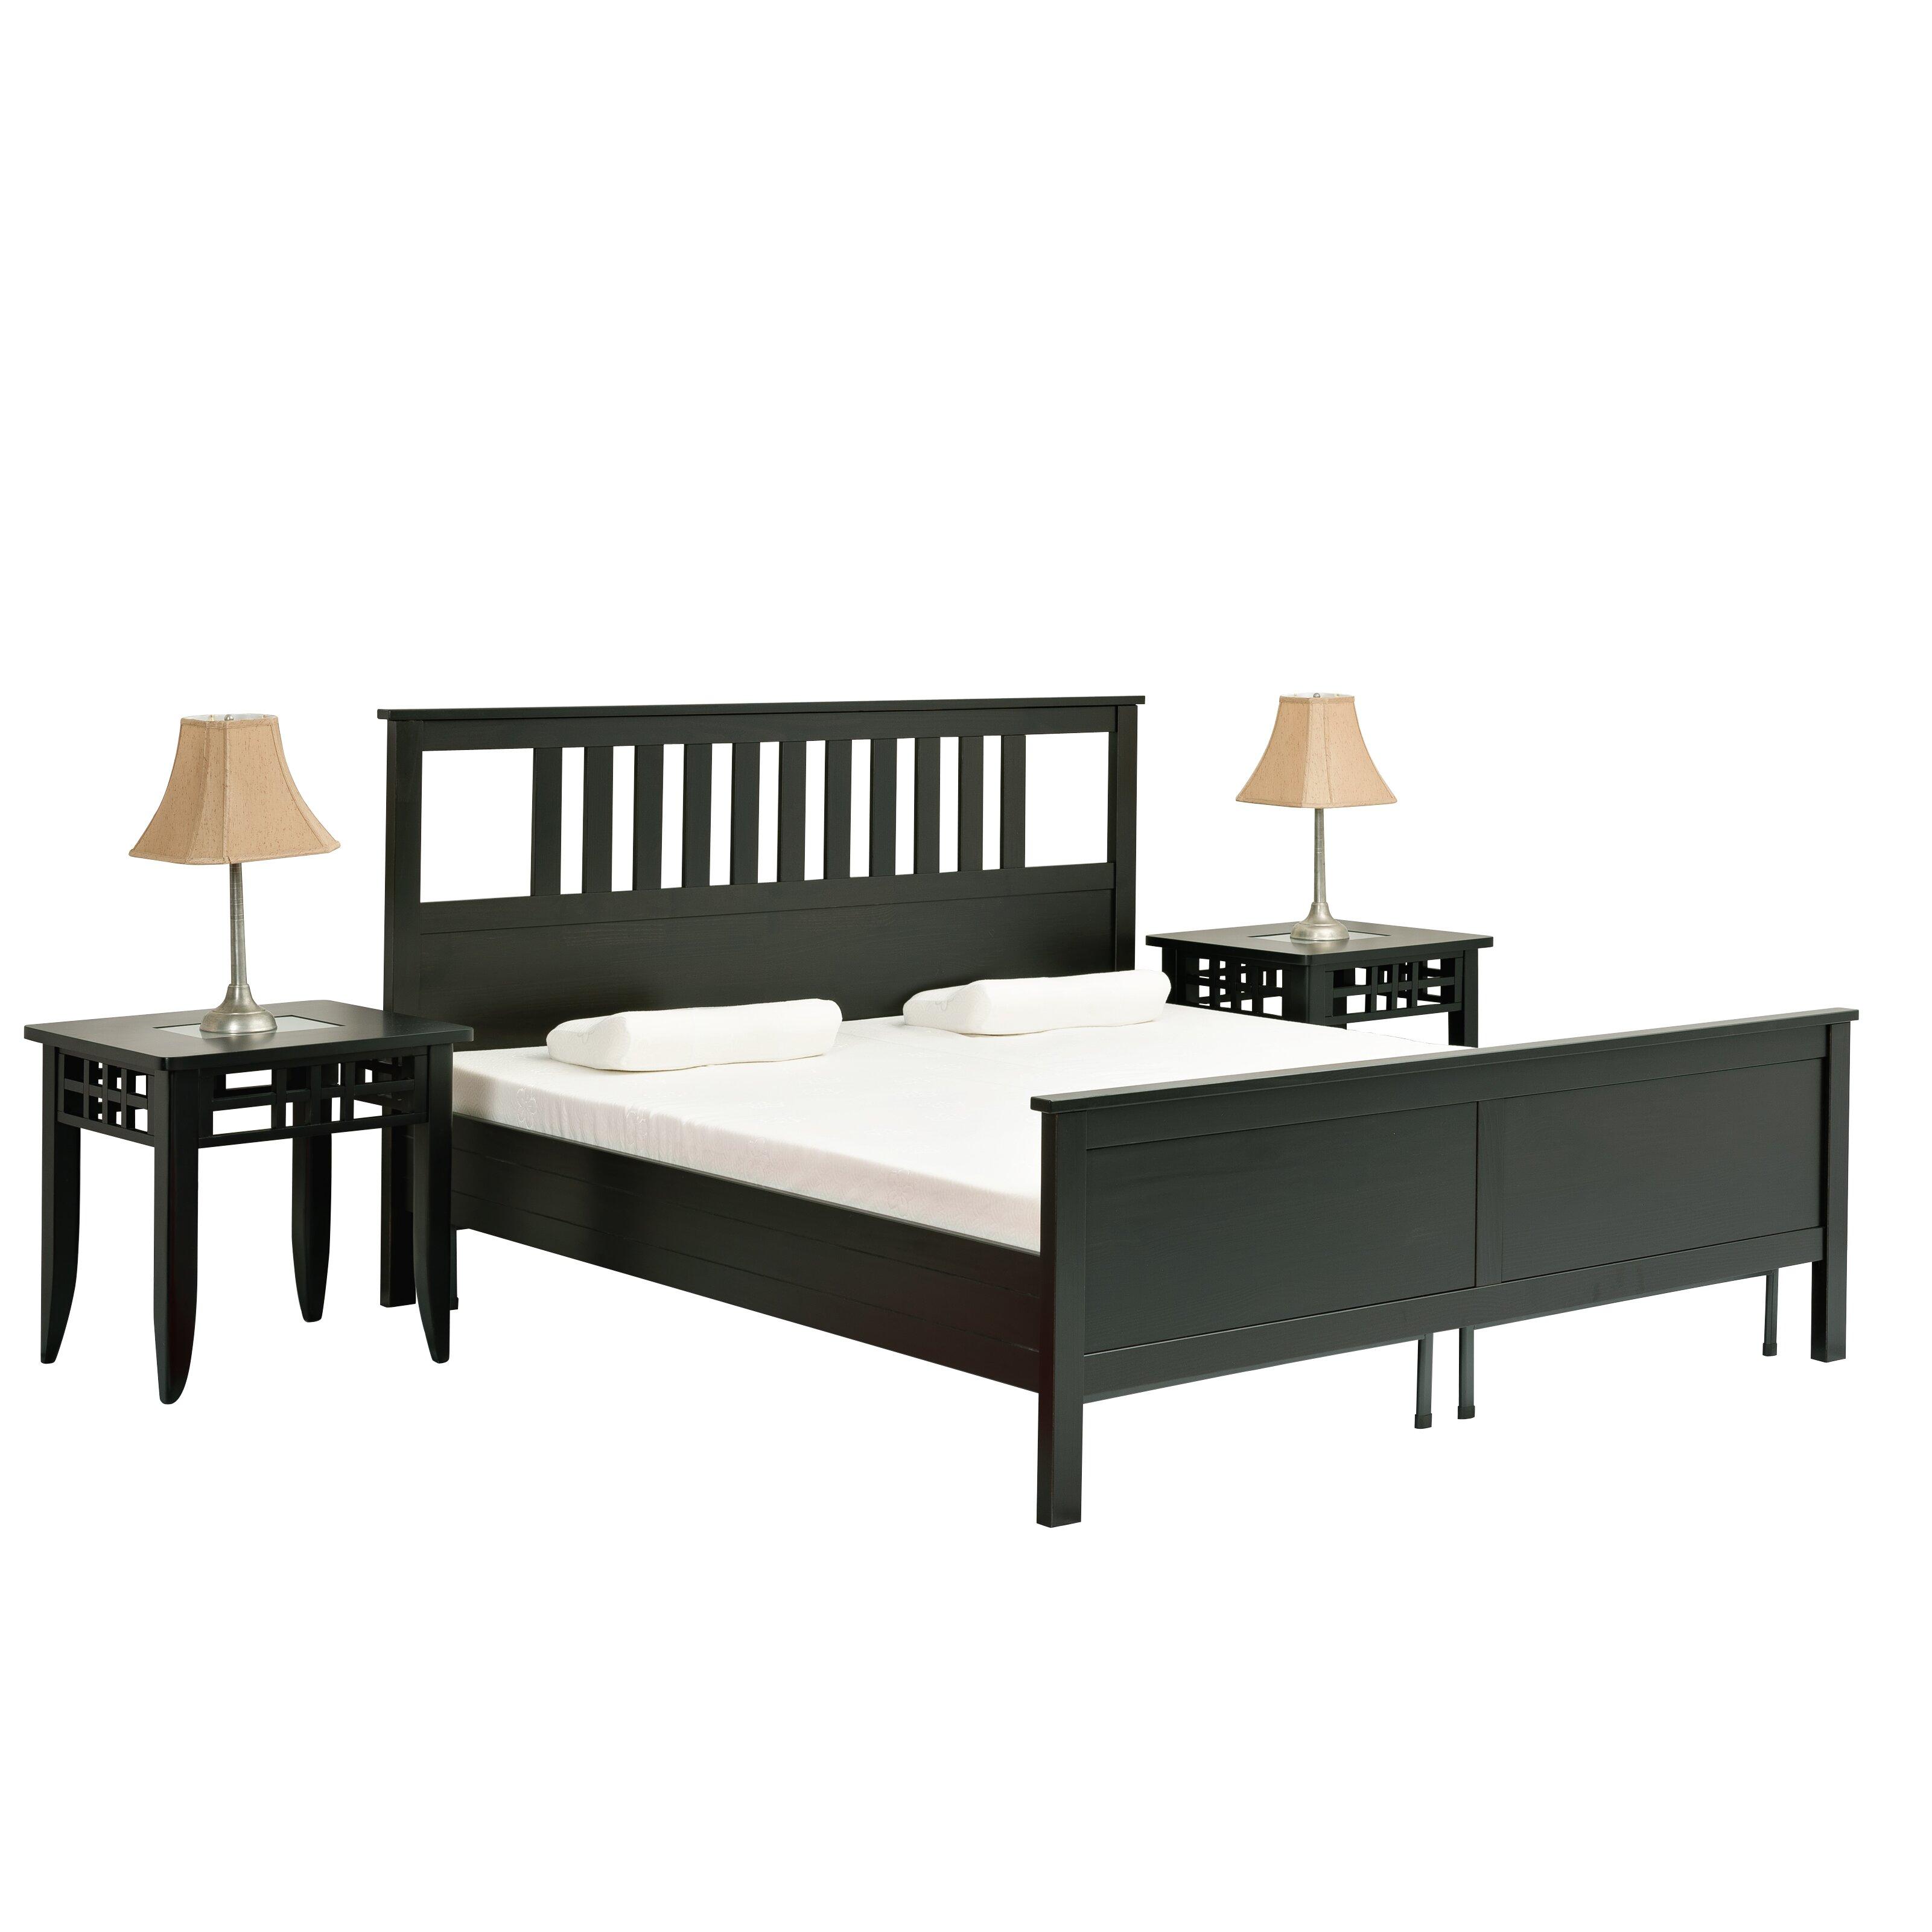 Pragma Bed Headboard And Footboard Bracket Set Of 2